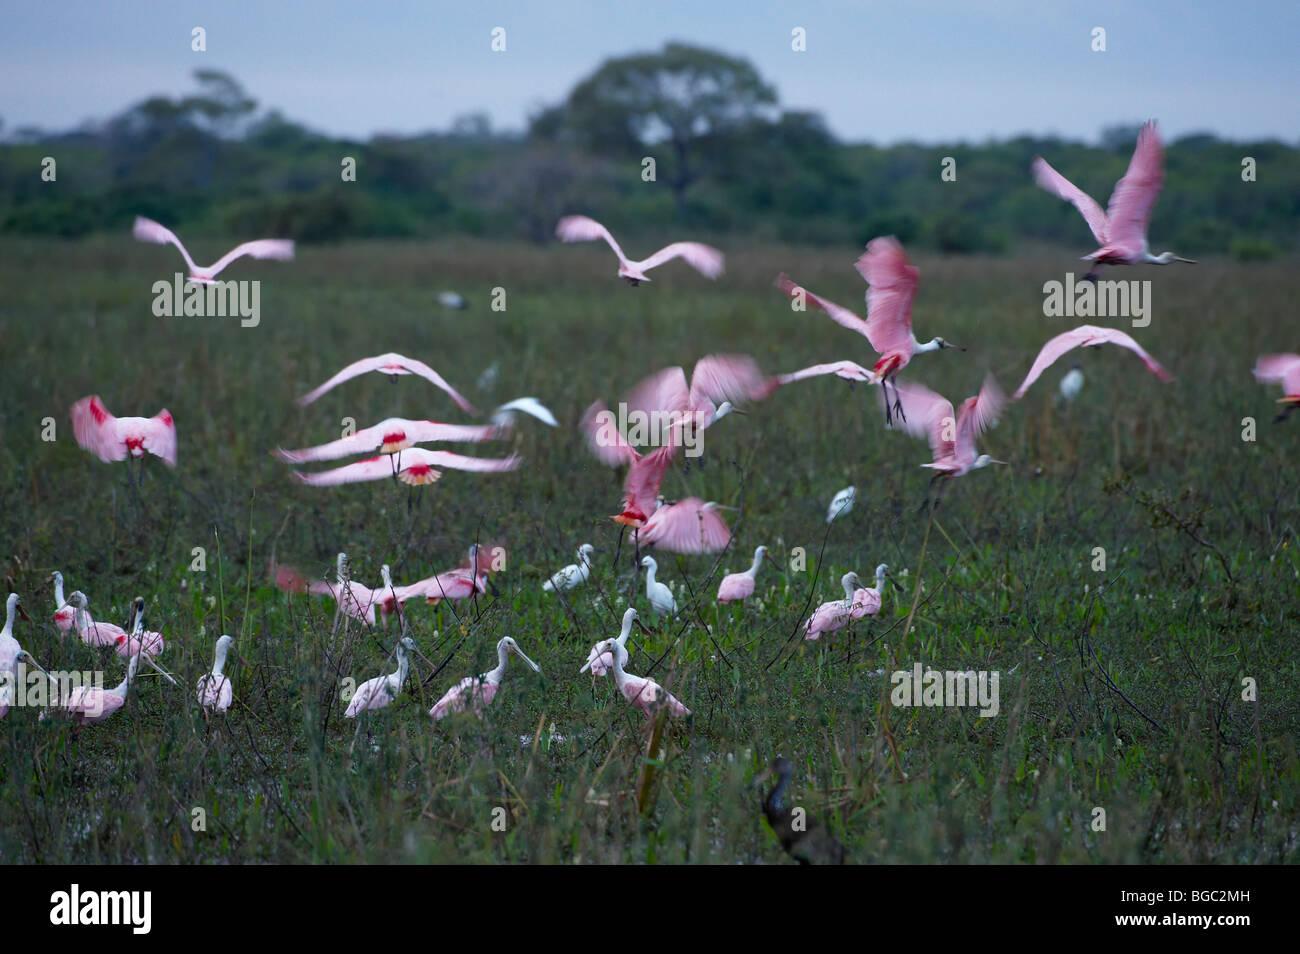 Flying espátulas rosadas, Ajaja ajaja desenfoque de movimiento, el pantanal de Mato Grosso, Mato Grosso, Brasil, Foto de stock